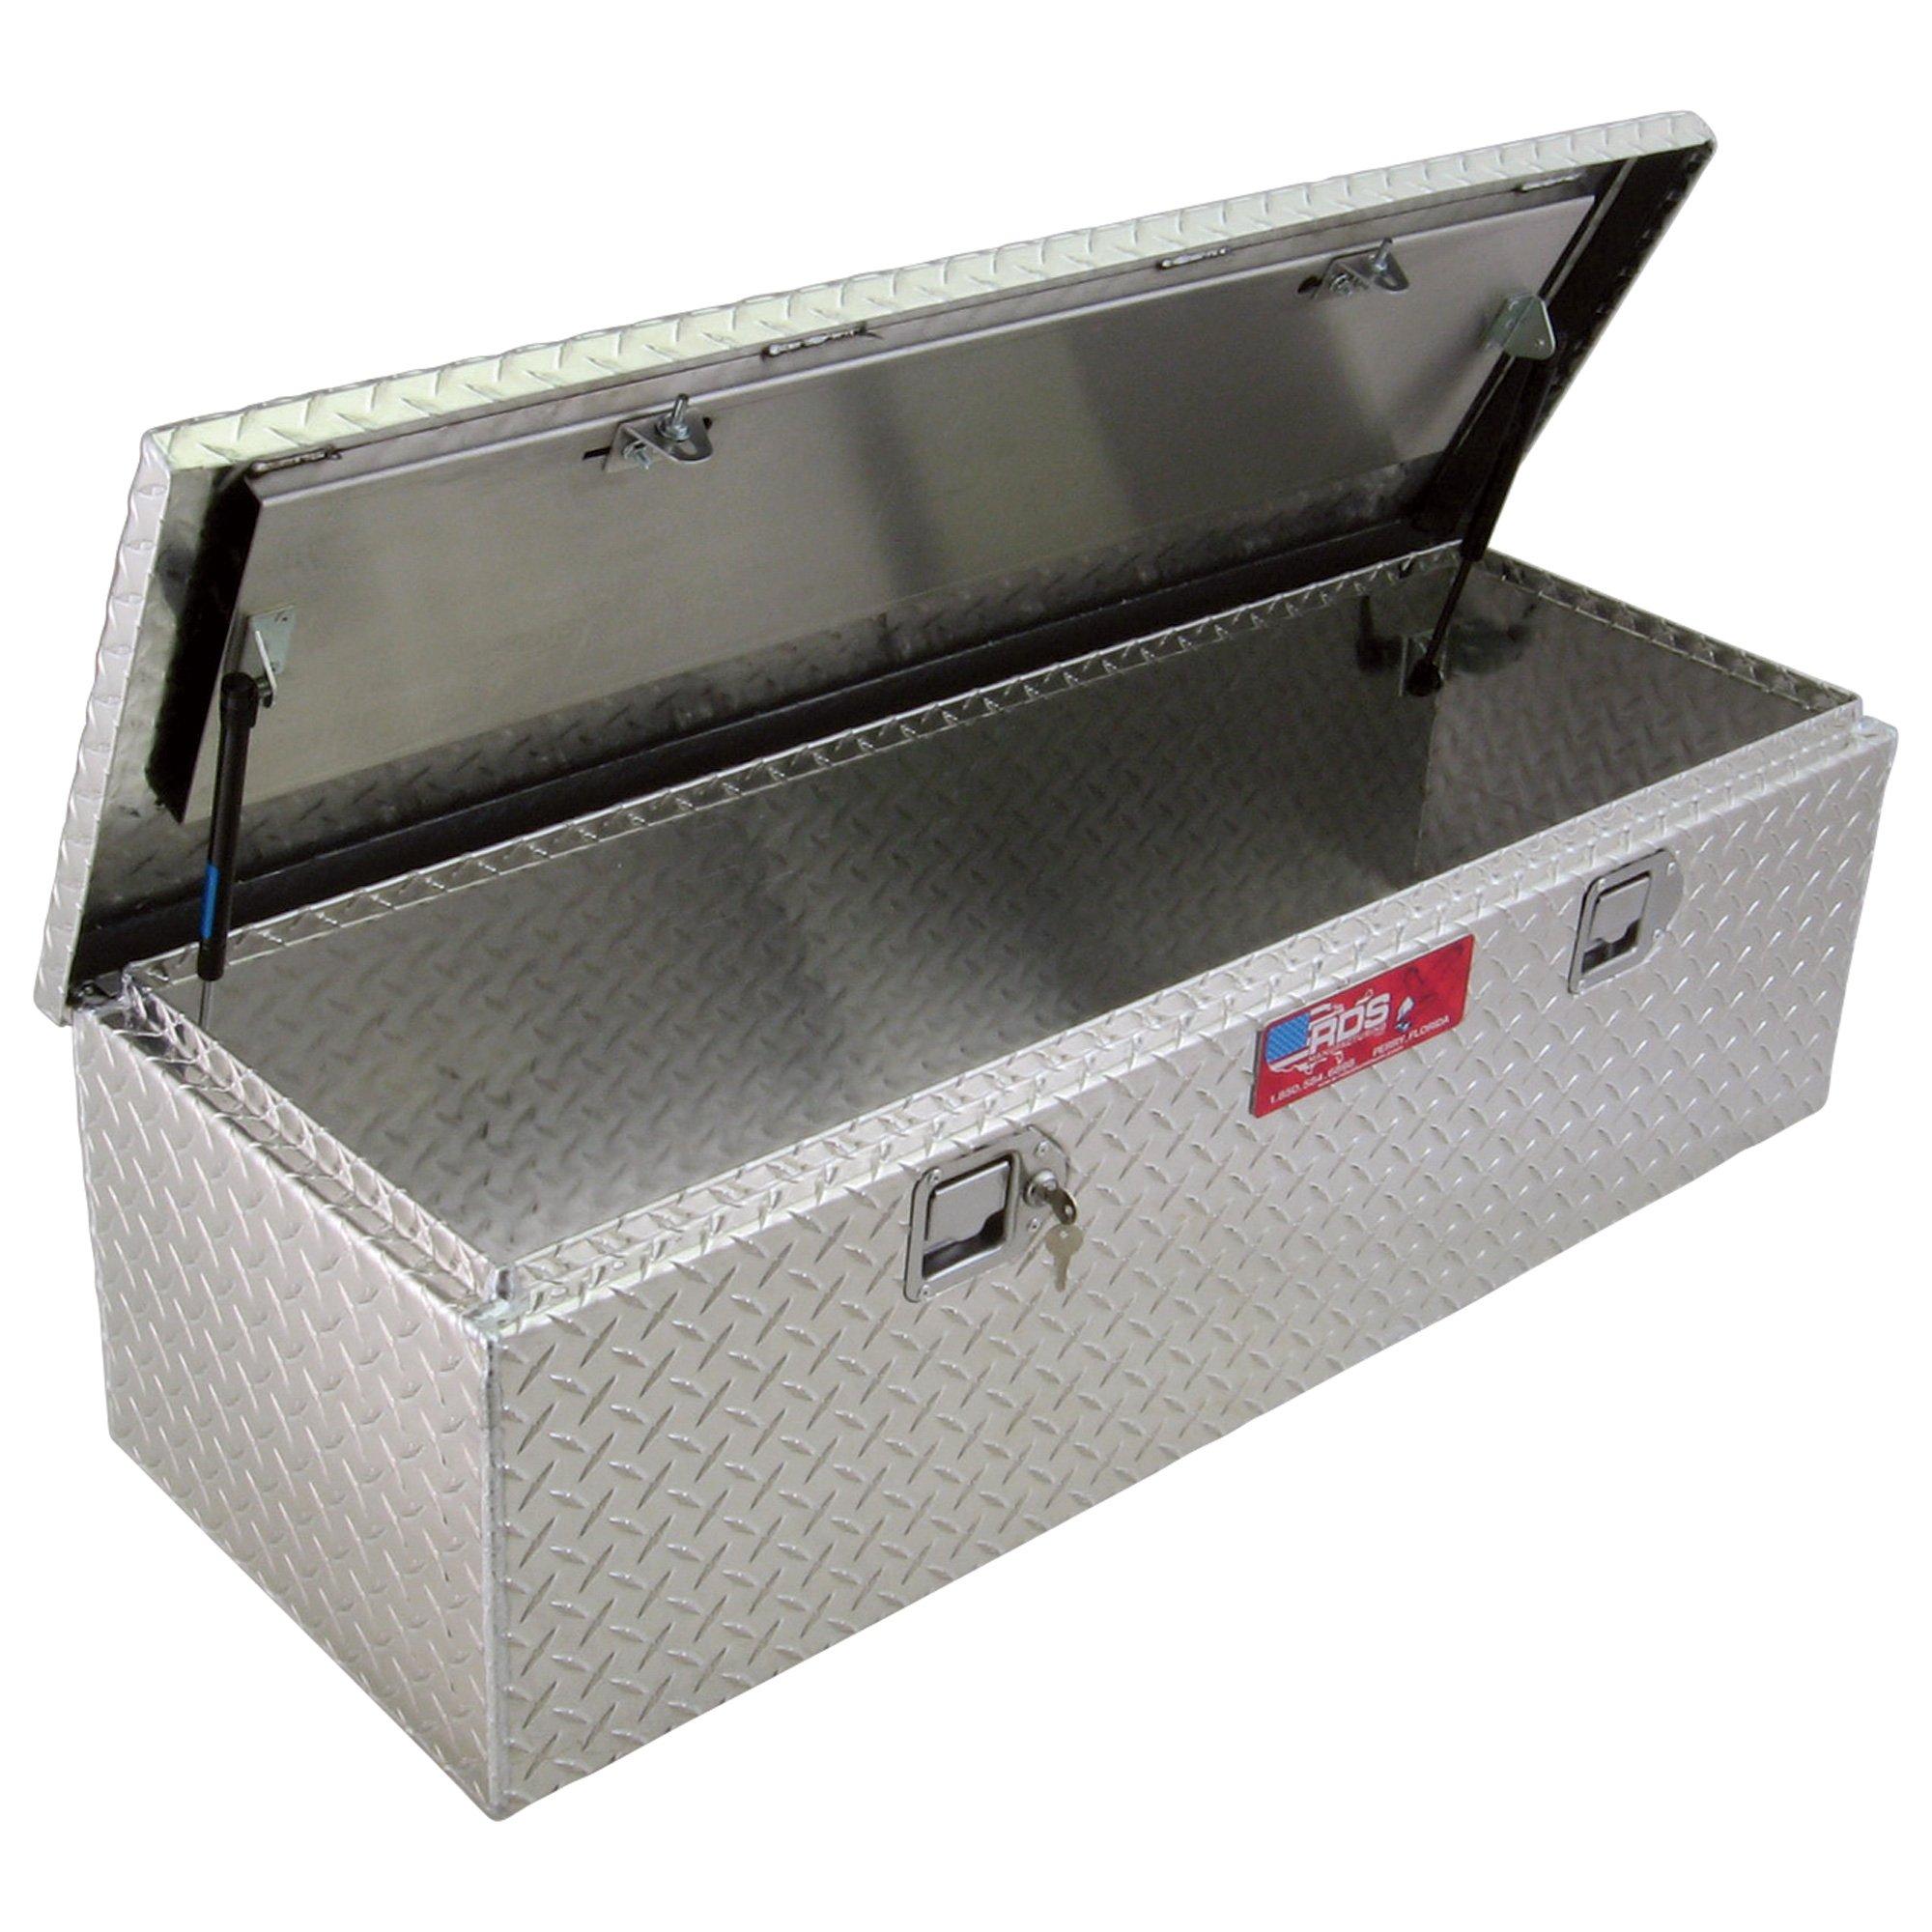 Weatherproof Aluminum Diamond Plate Storage Container Box with Lock